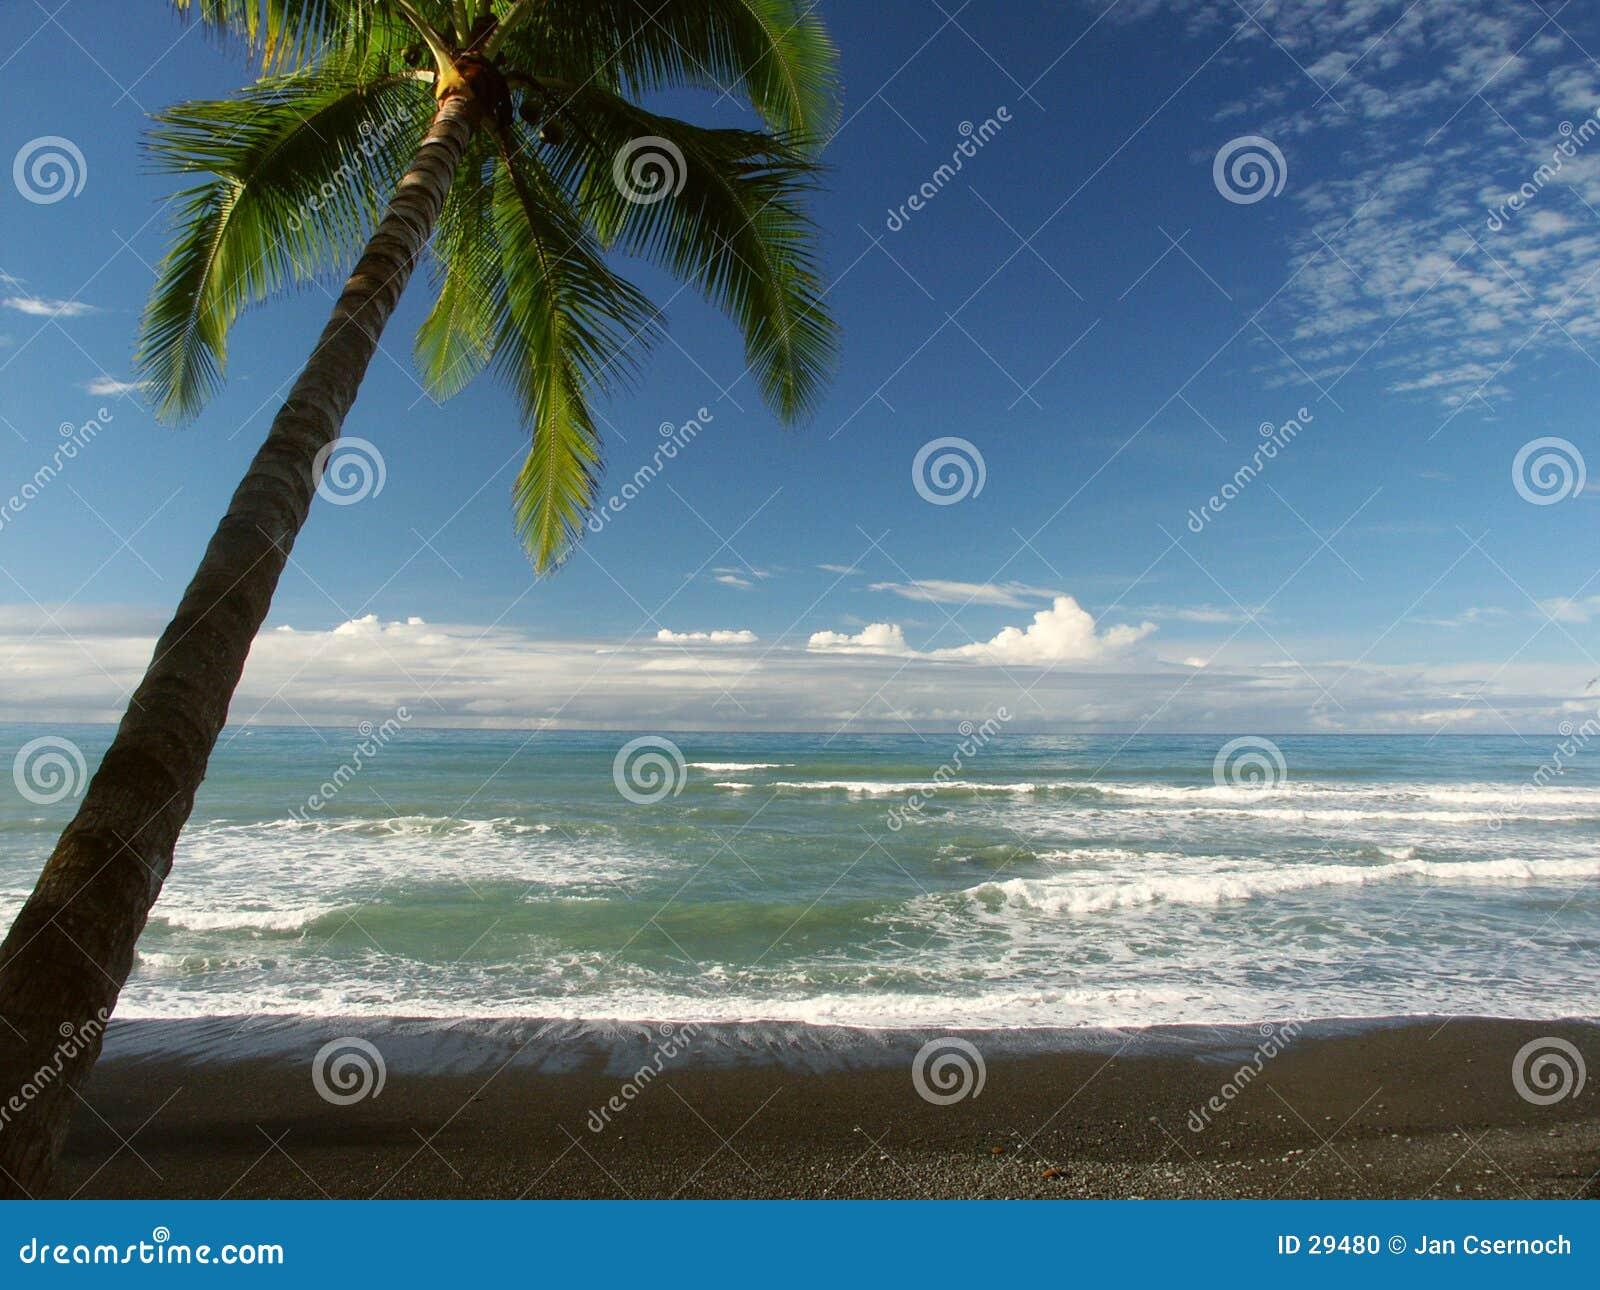 Seaview with palmtree